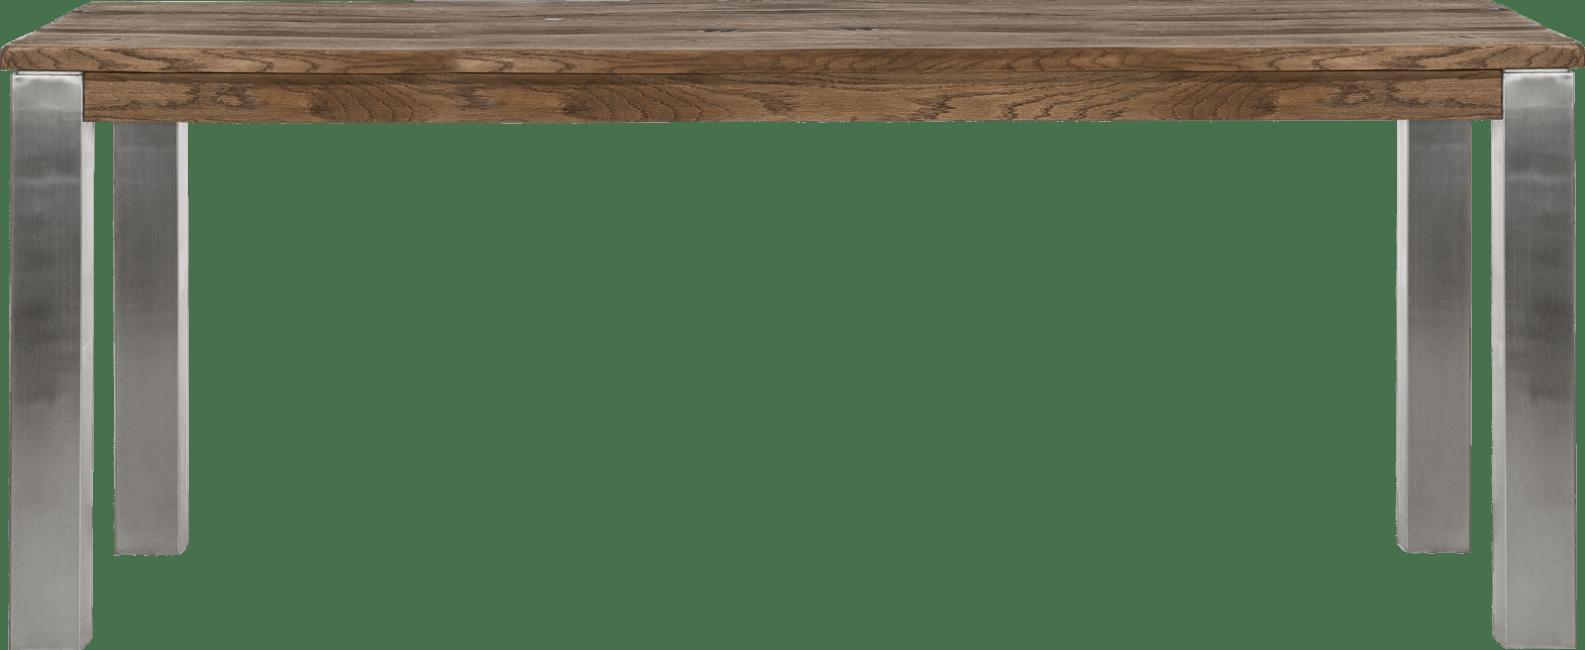 Masters - eetkamertafel 200 x 100 cm - rvs 9x9